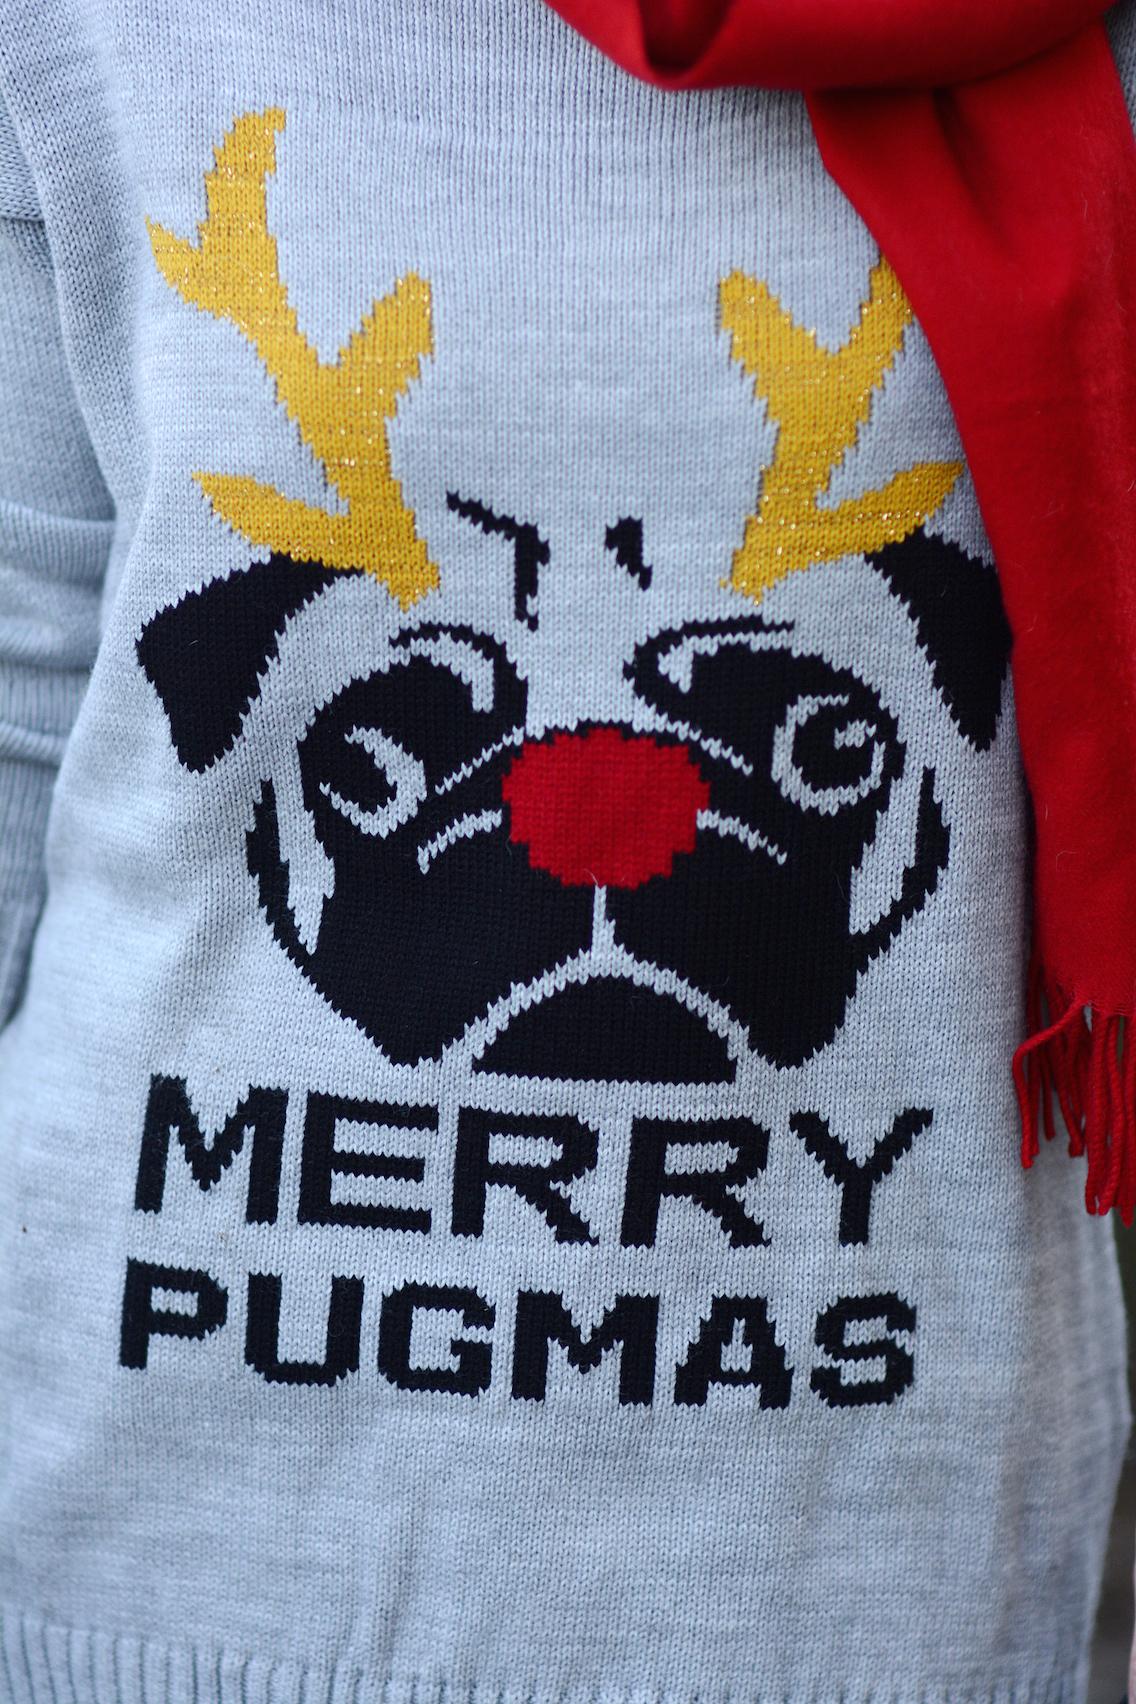 Missguided Merry Pugmas Sweater Stuart Weitzman Lowland Boots 11